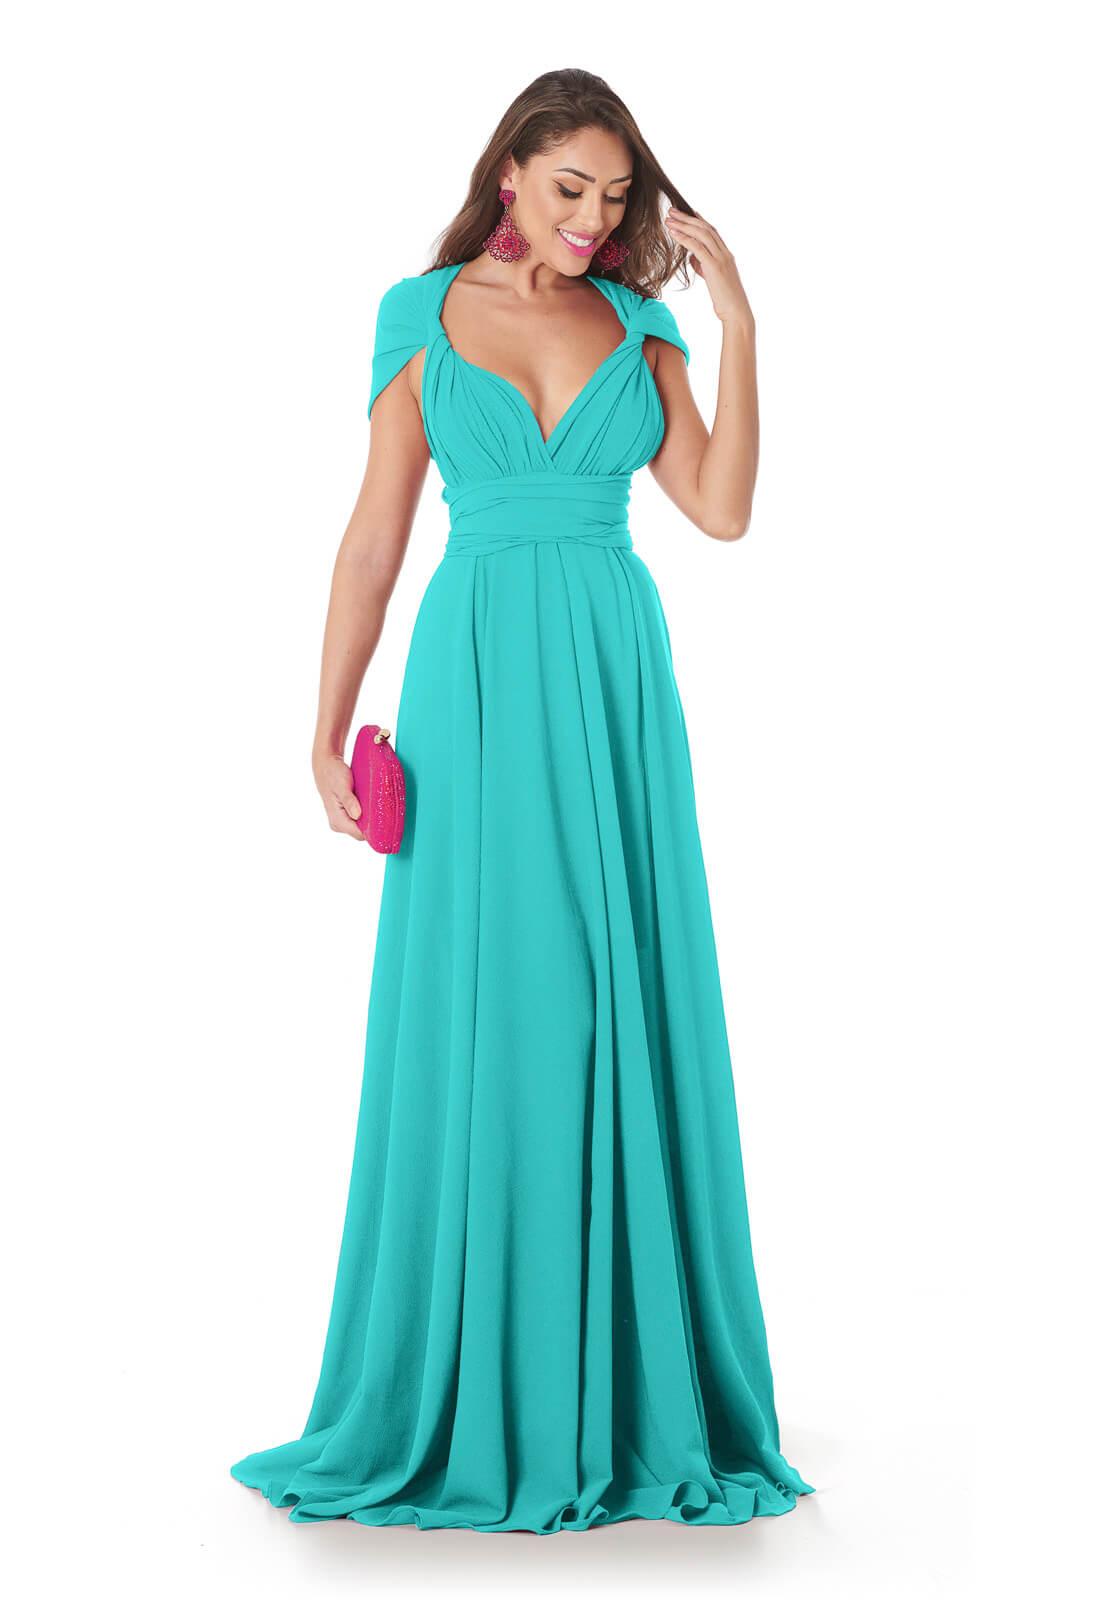 Vestido Longo Mil Formas Tiffany Lala Dubi